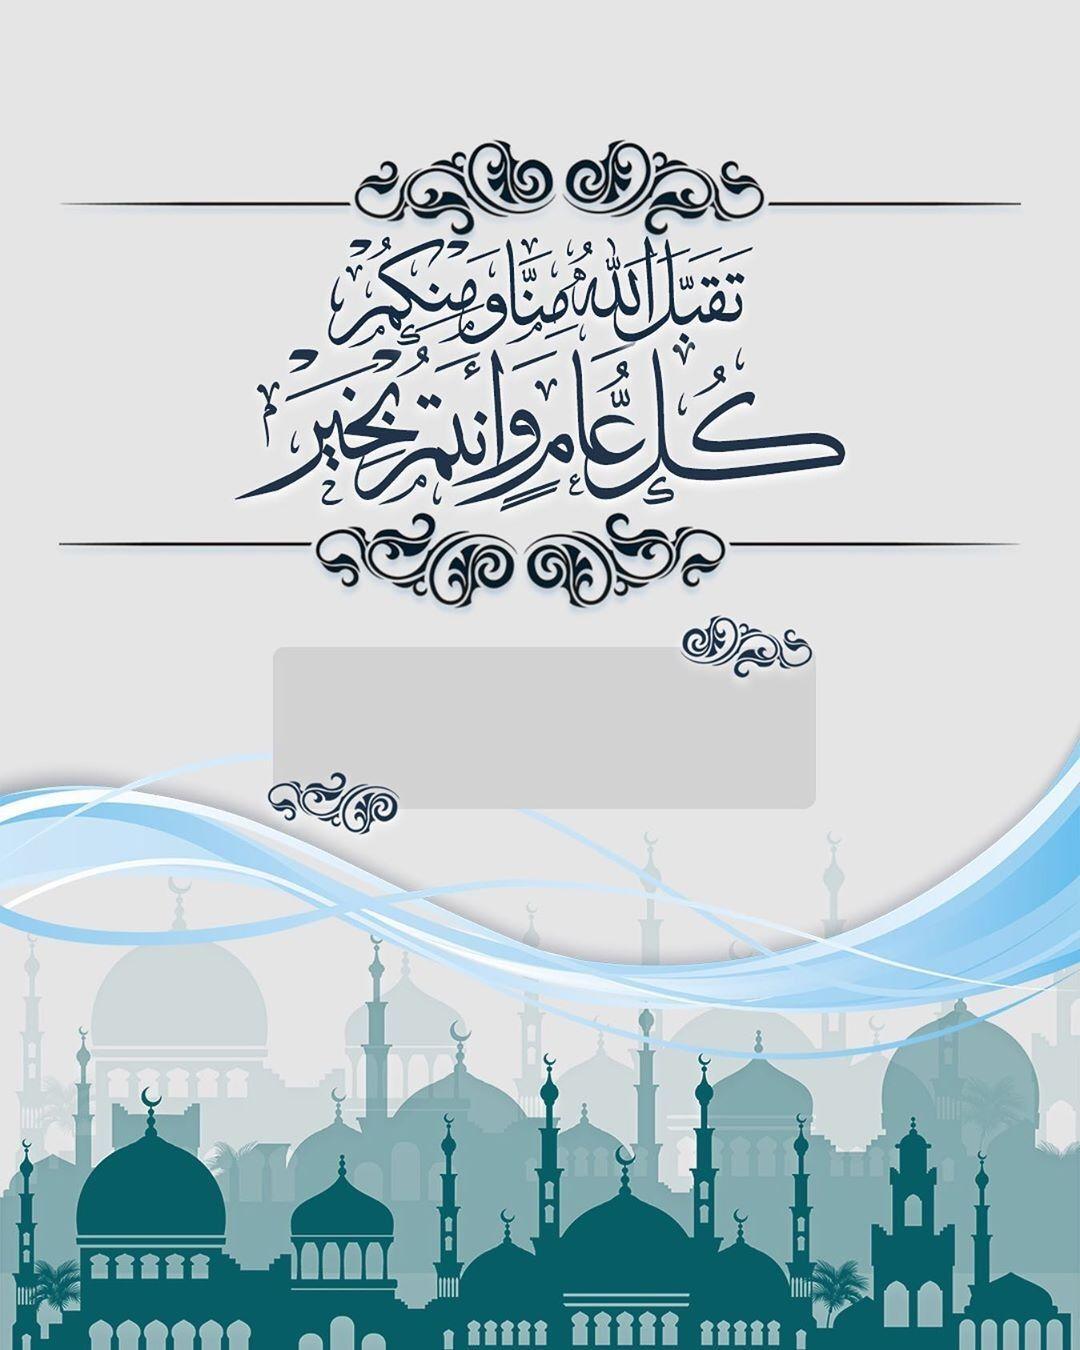 Pin By Mohammd Alk On Good Morning صباح الخير Eid Mubarak Wallpaper Eid Stickers Eid Cards